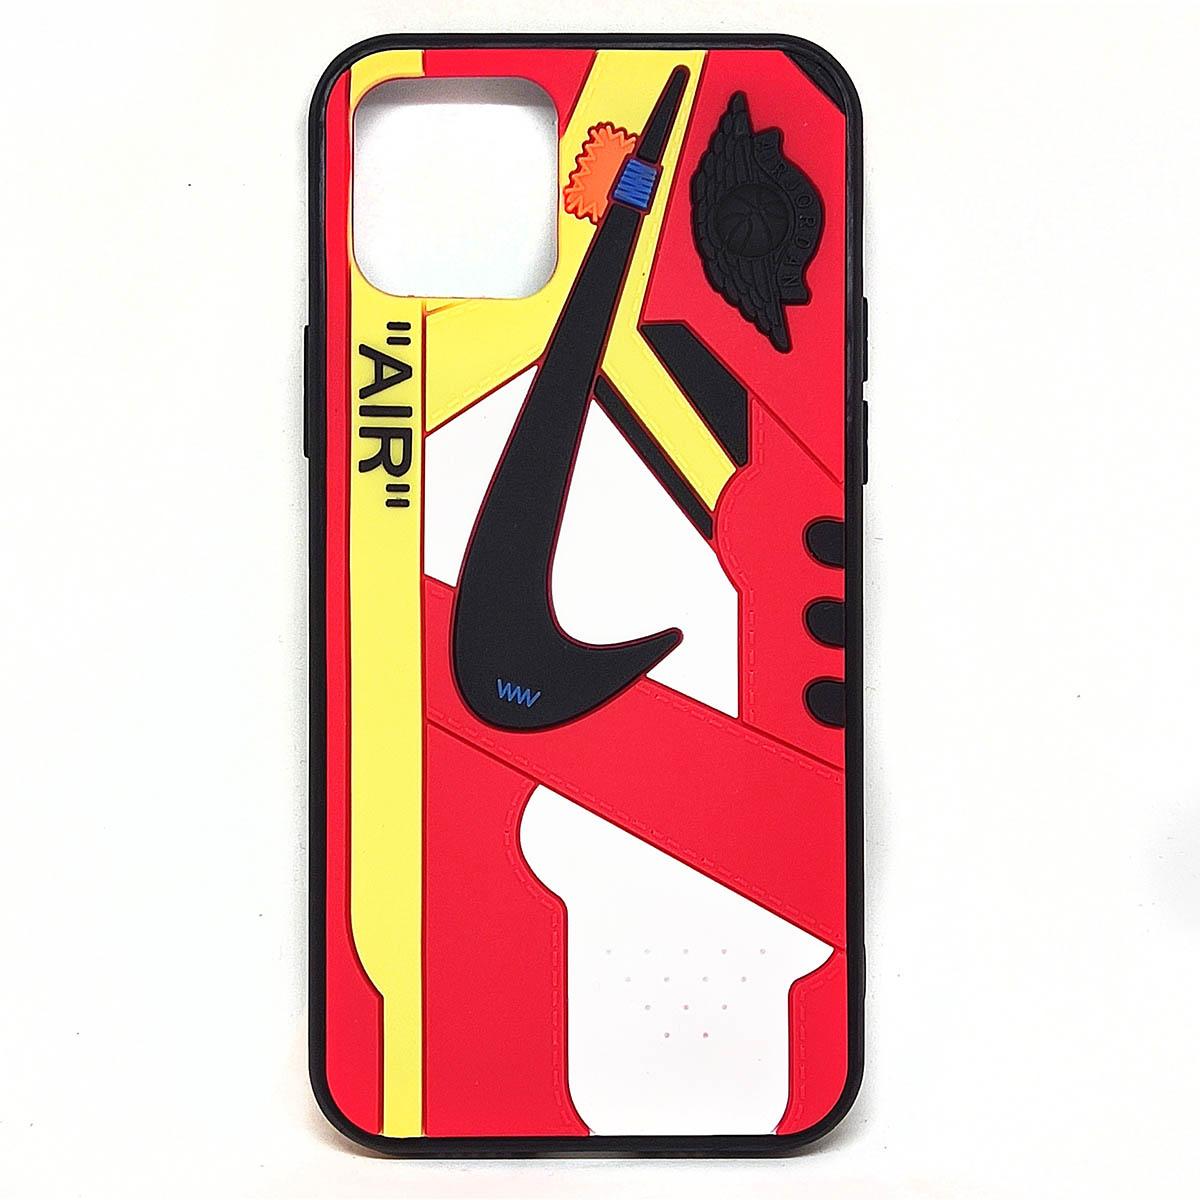 Cover AJ1 Chicago Air rossa per iphone 12, 12 pro, 12 mini, 12 pro max | Blacksheep Store